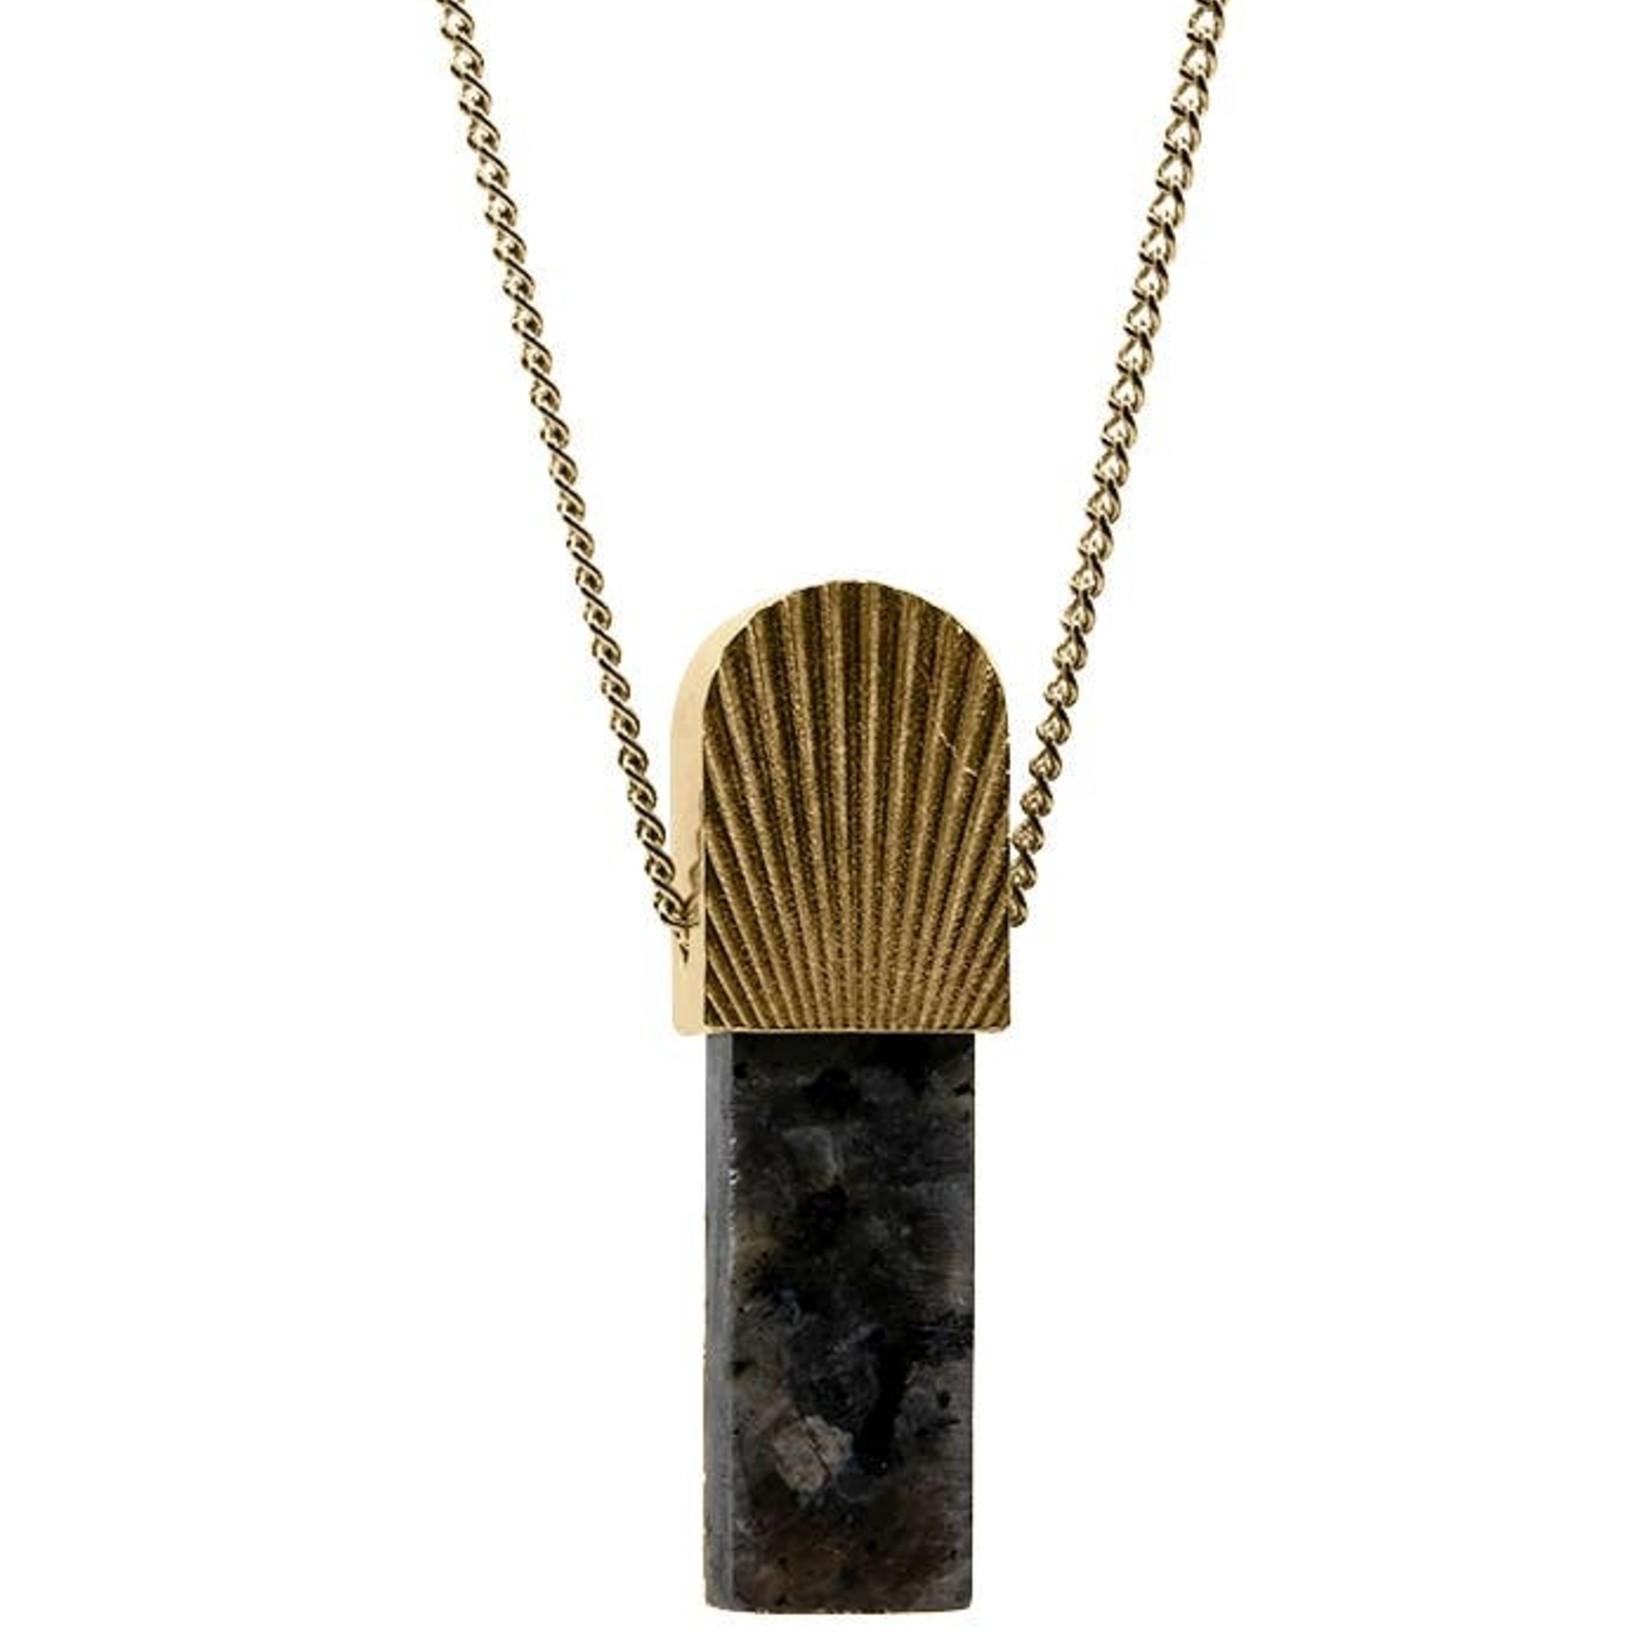 Mana Made Jewelry Mana Made Sunburst Larvikite Stone Necklace